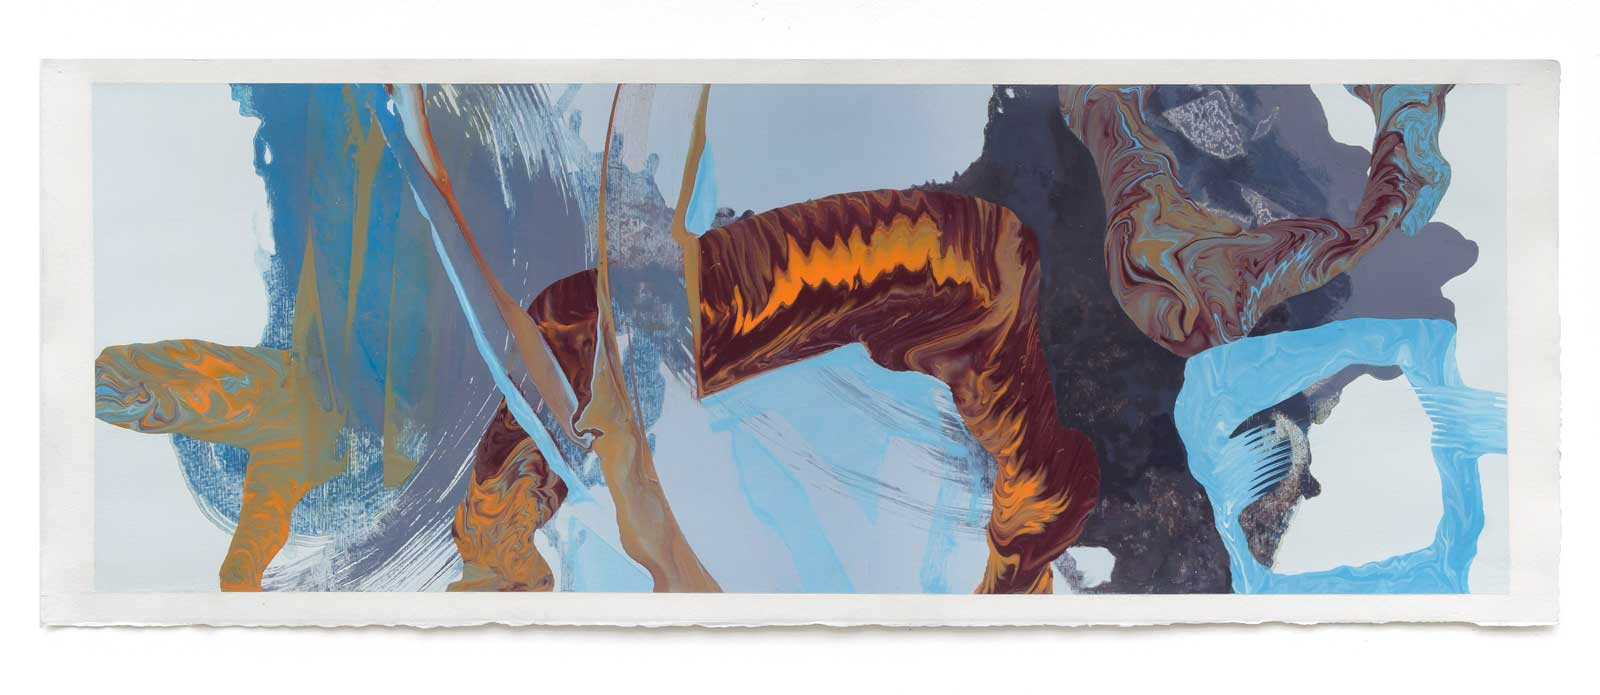 Disruptions-2-oil-on-paper-25.4 cm x 71.12 cm.